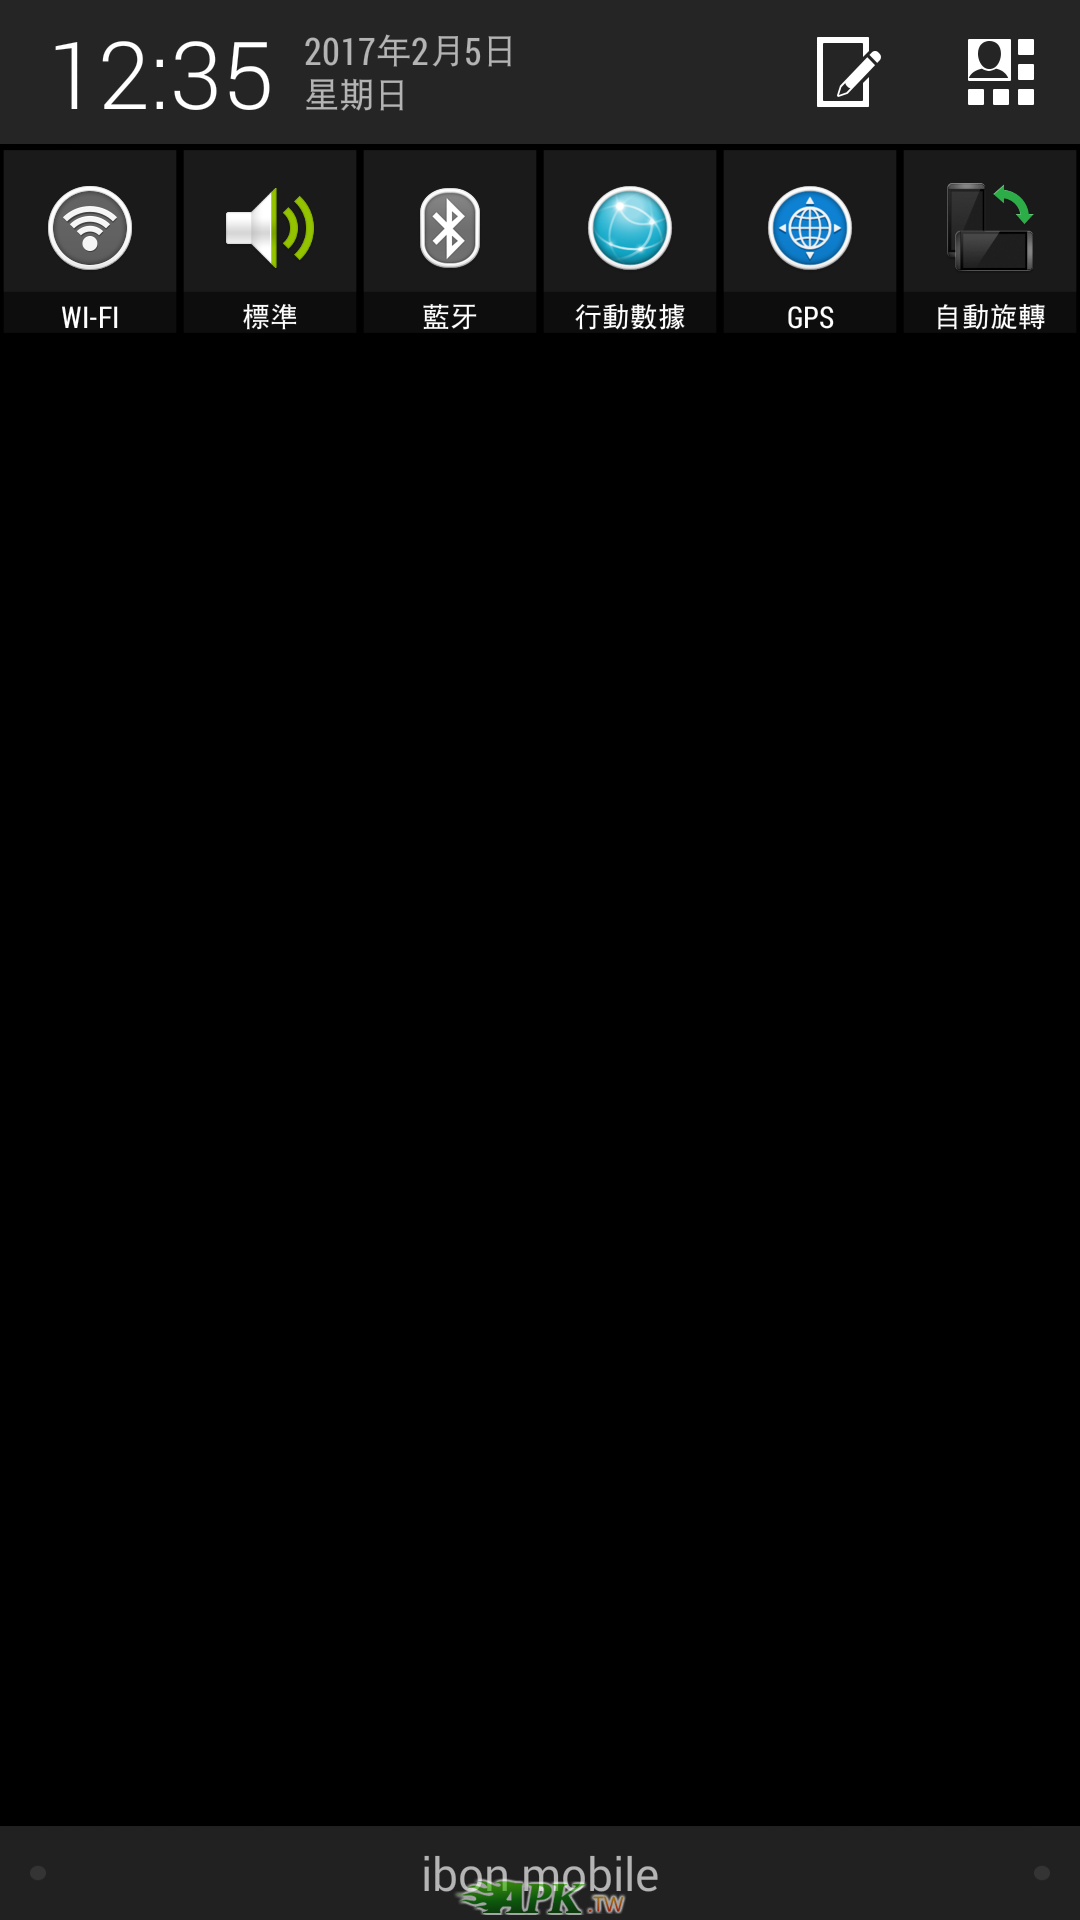 Screenshot_2017-02-05-12-35-17.png